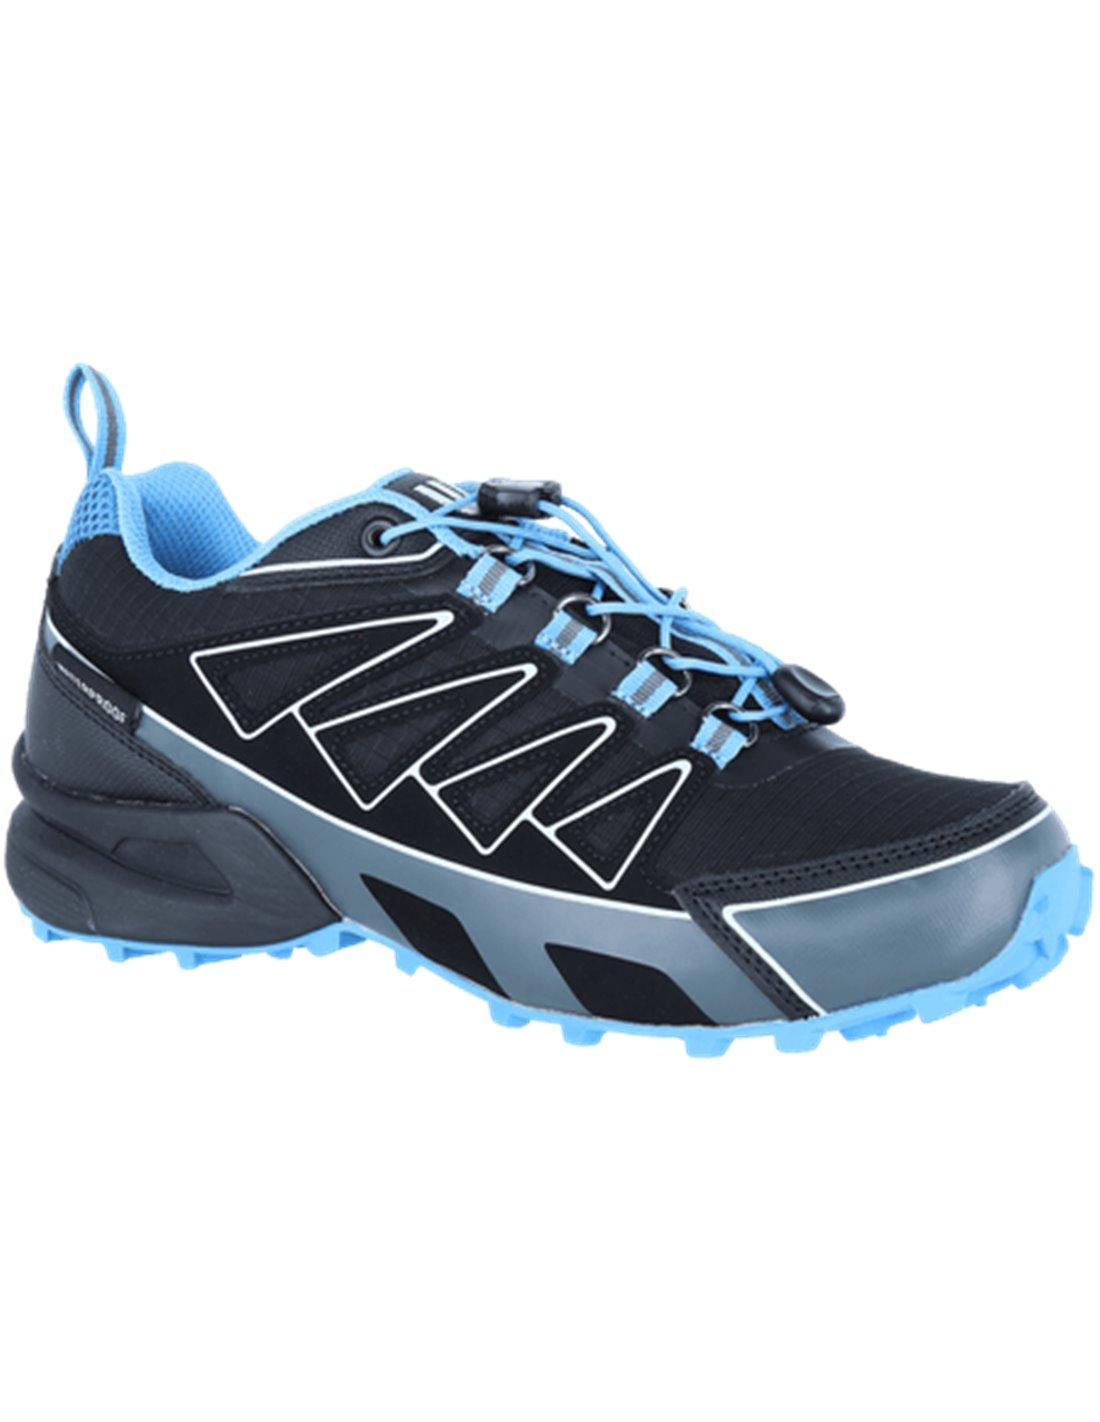 Hikingsko Dame Sway Bratt Low Dame SW30045 599 kr